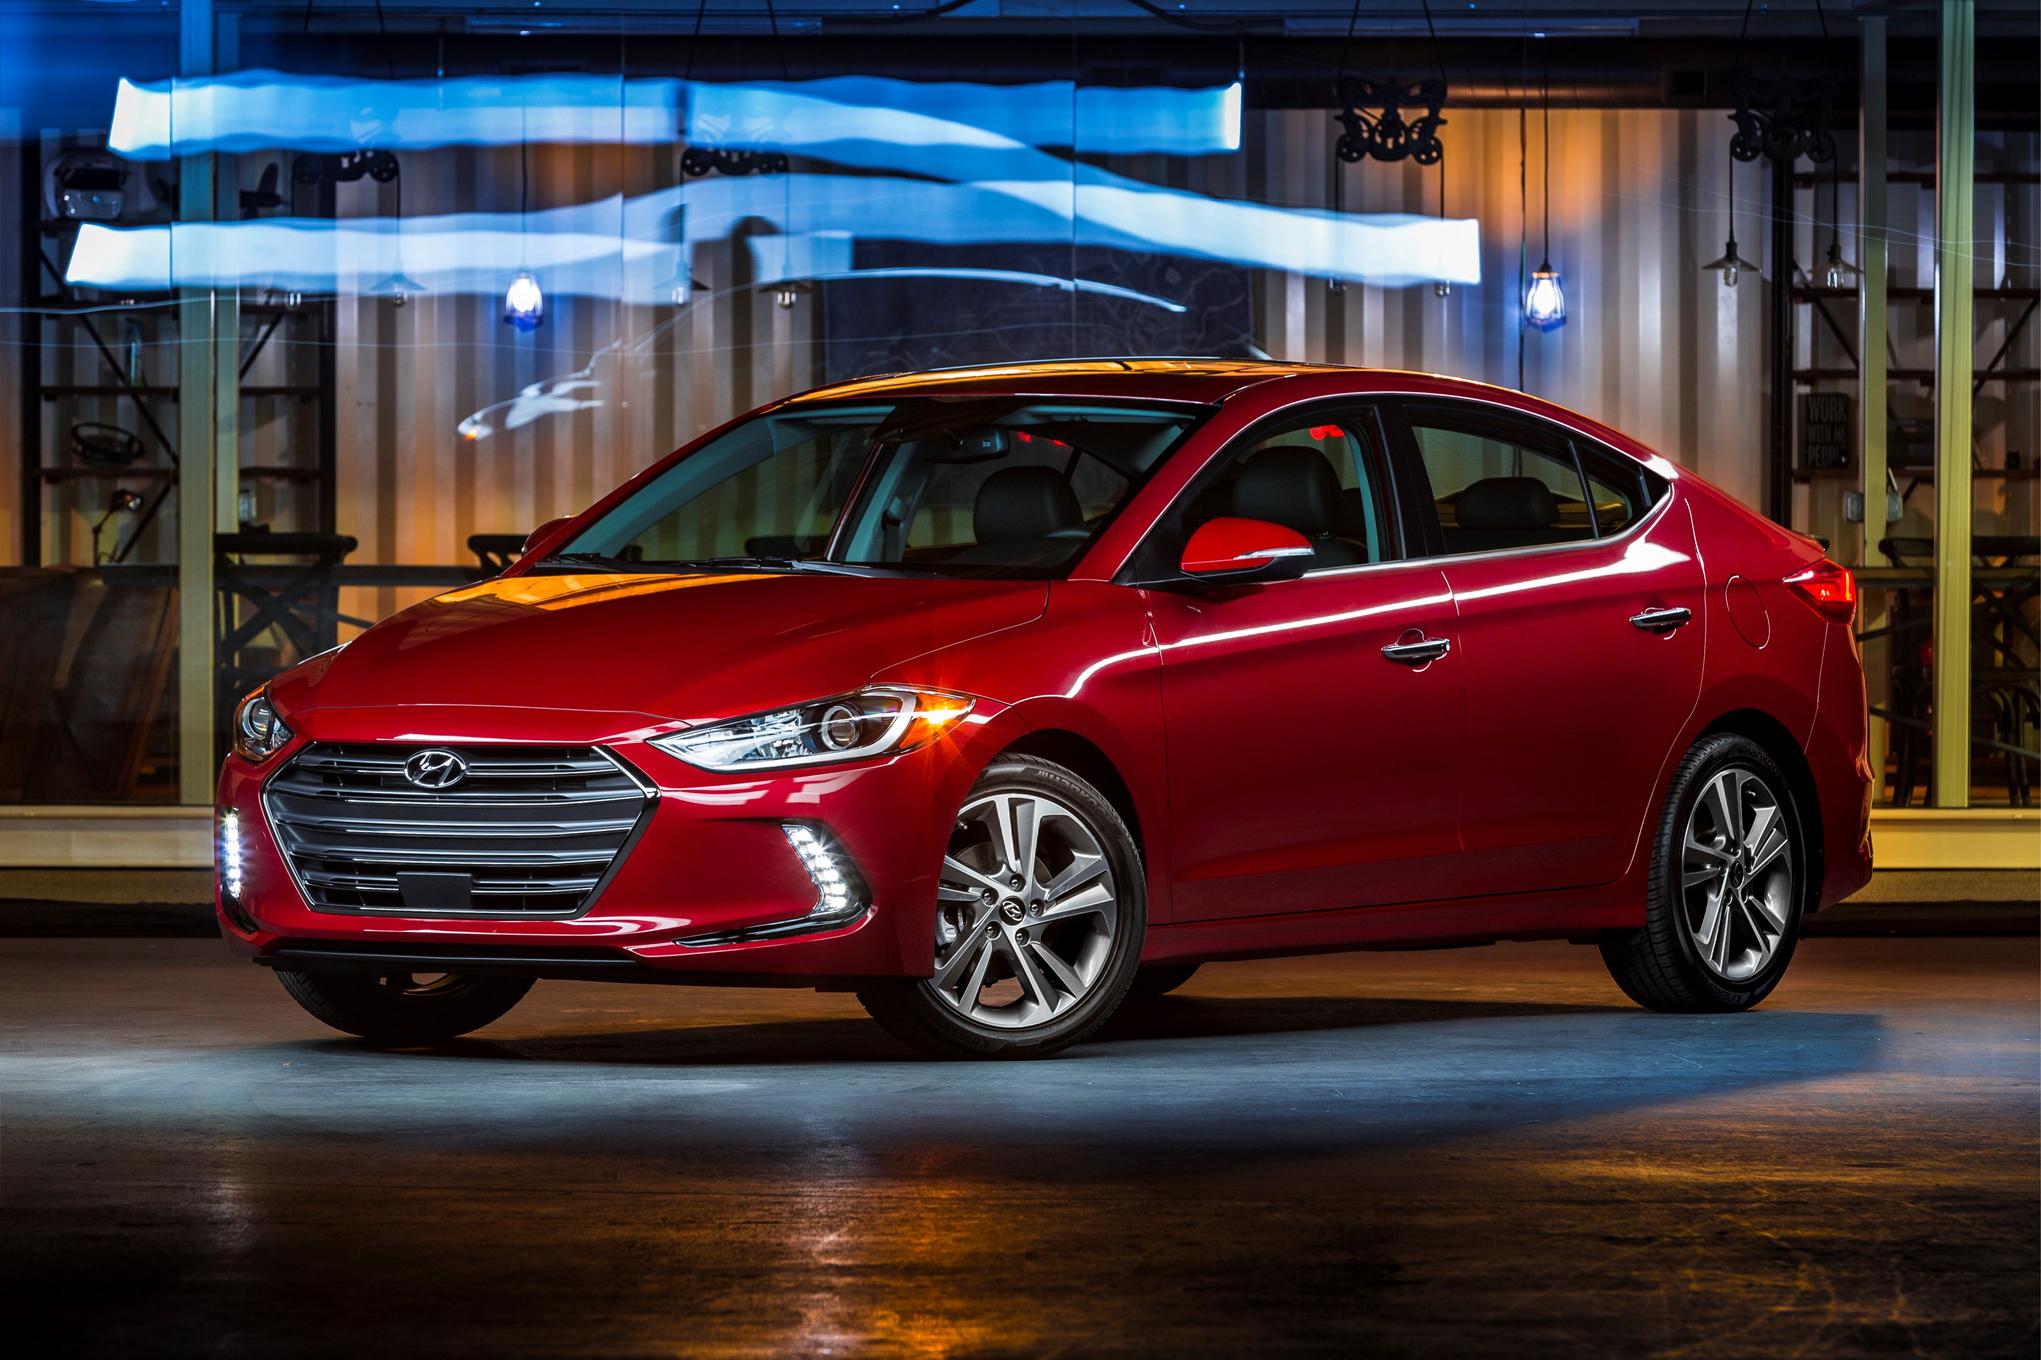 Red 2017 Hyundai Elantra >> 2017 Hyundai Elantra Servo Ppf